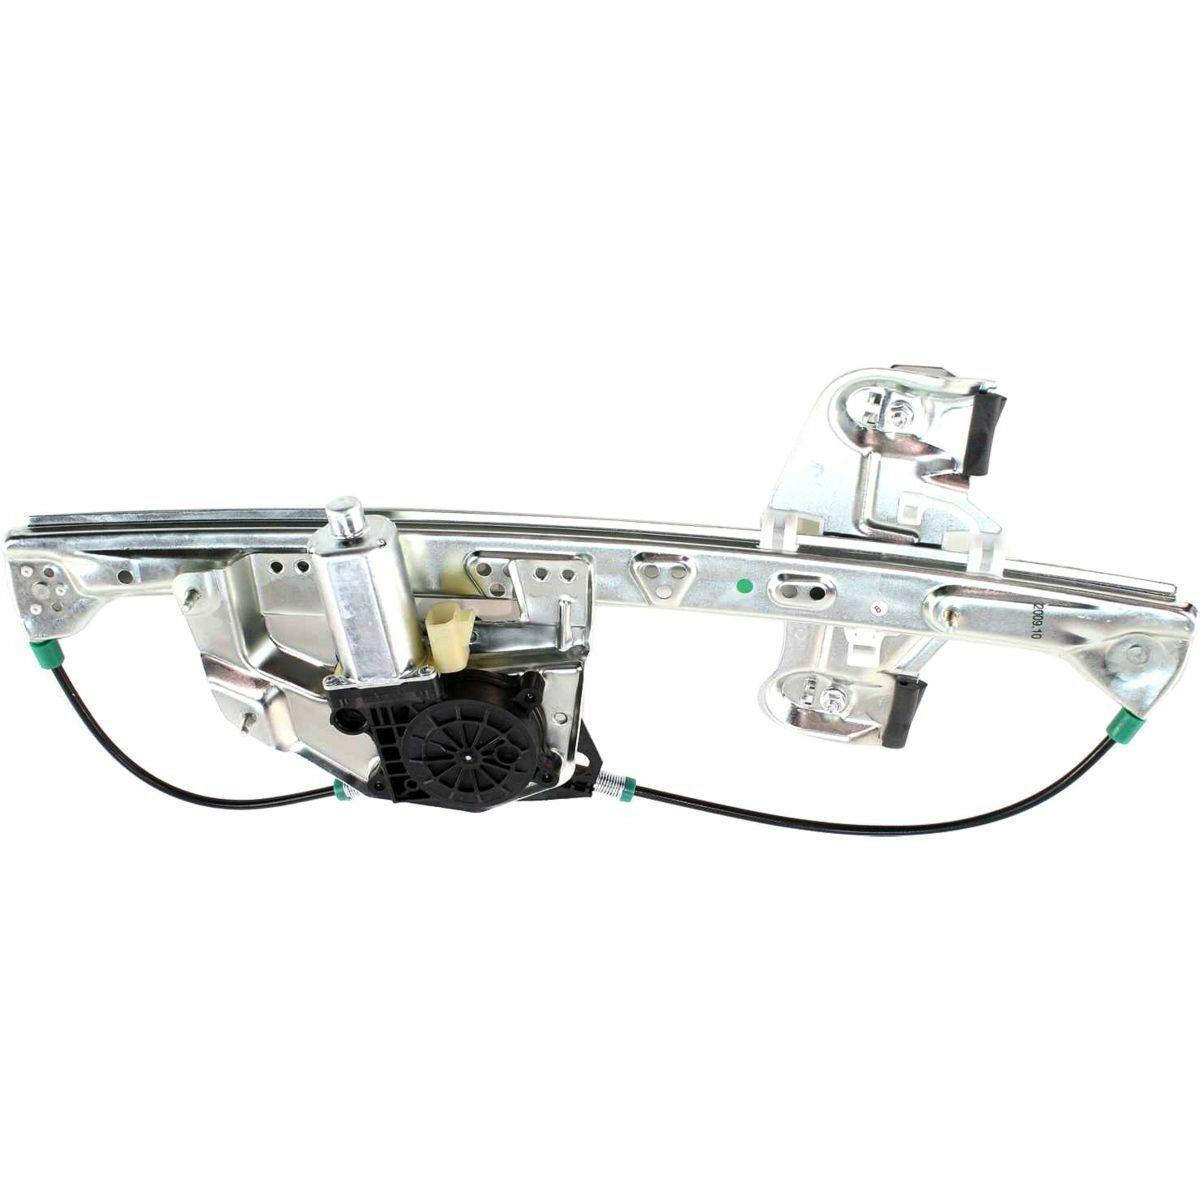 NEW REAR LH POWER WINDOW REGULATOR WITH MOTOR FITS